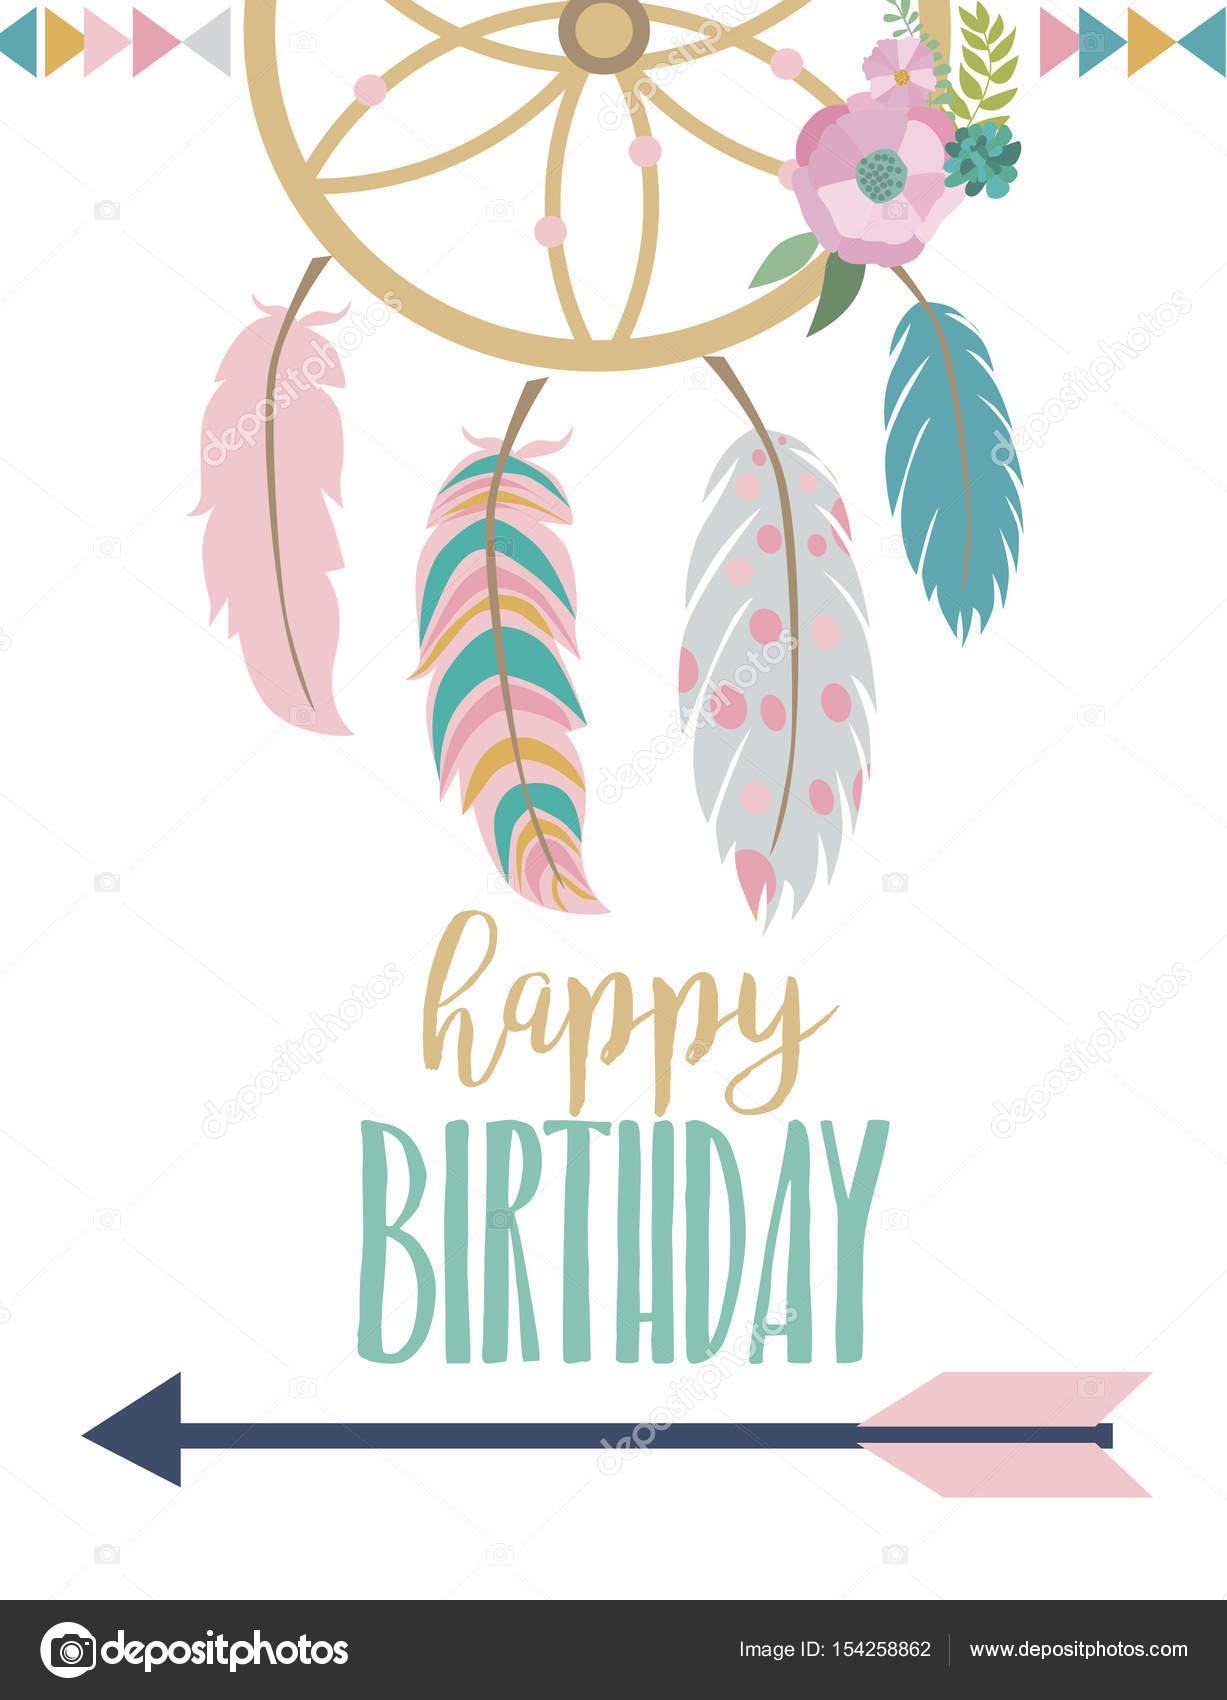 Happy birthday card template in boho style \u2014 Stock Vector © Vissay